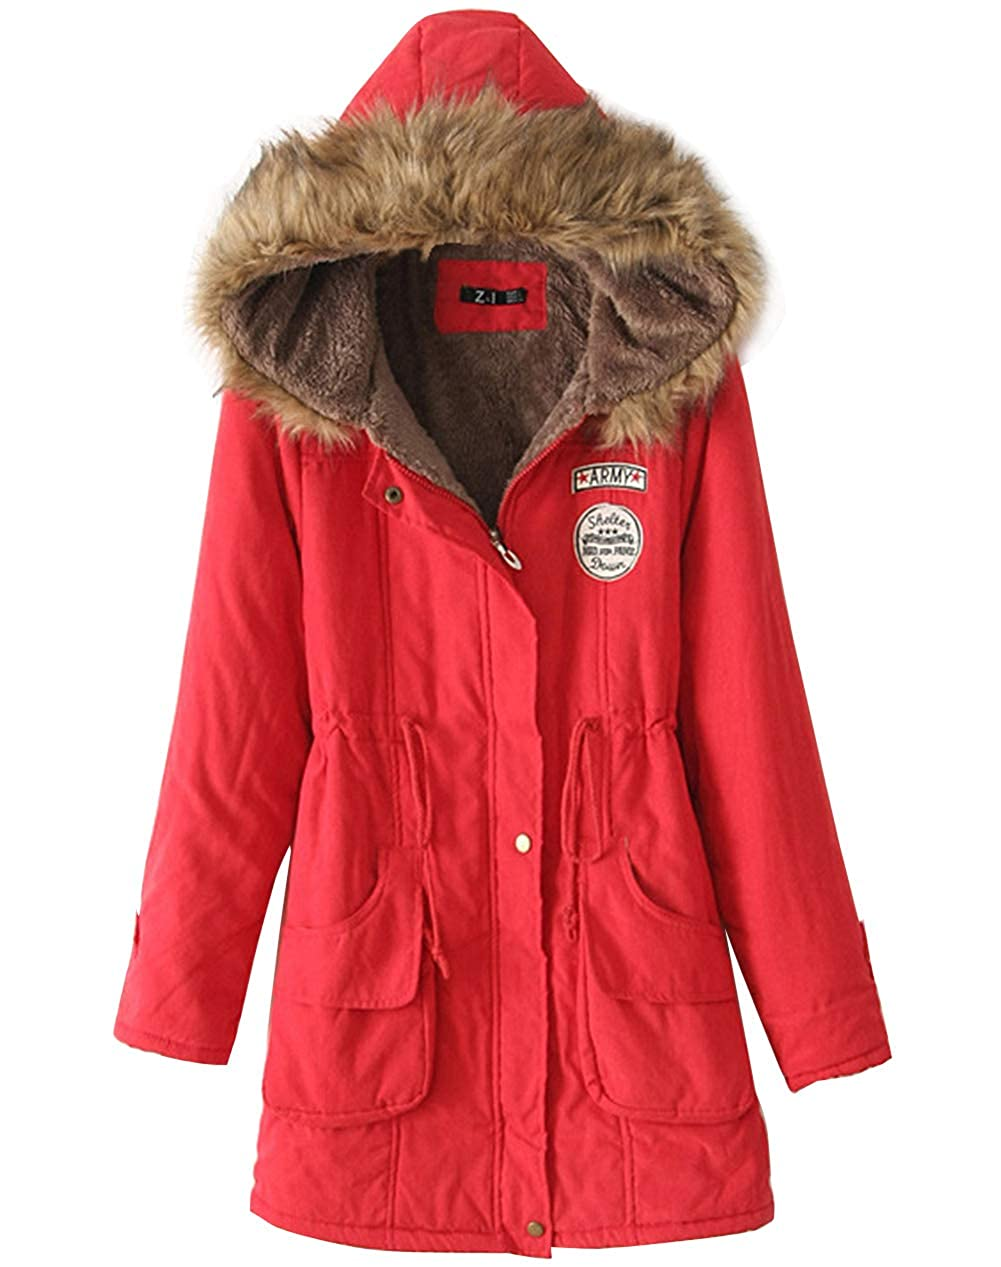 Z& I Womens Fur Trim Hooded Winter Coat Thicken Zipper Jacket Lambswool Inner Parka